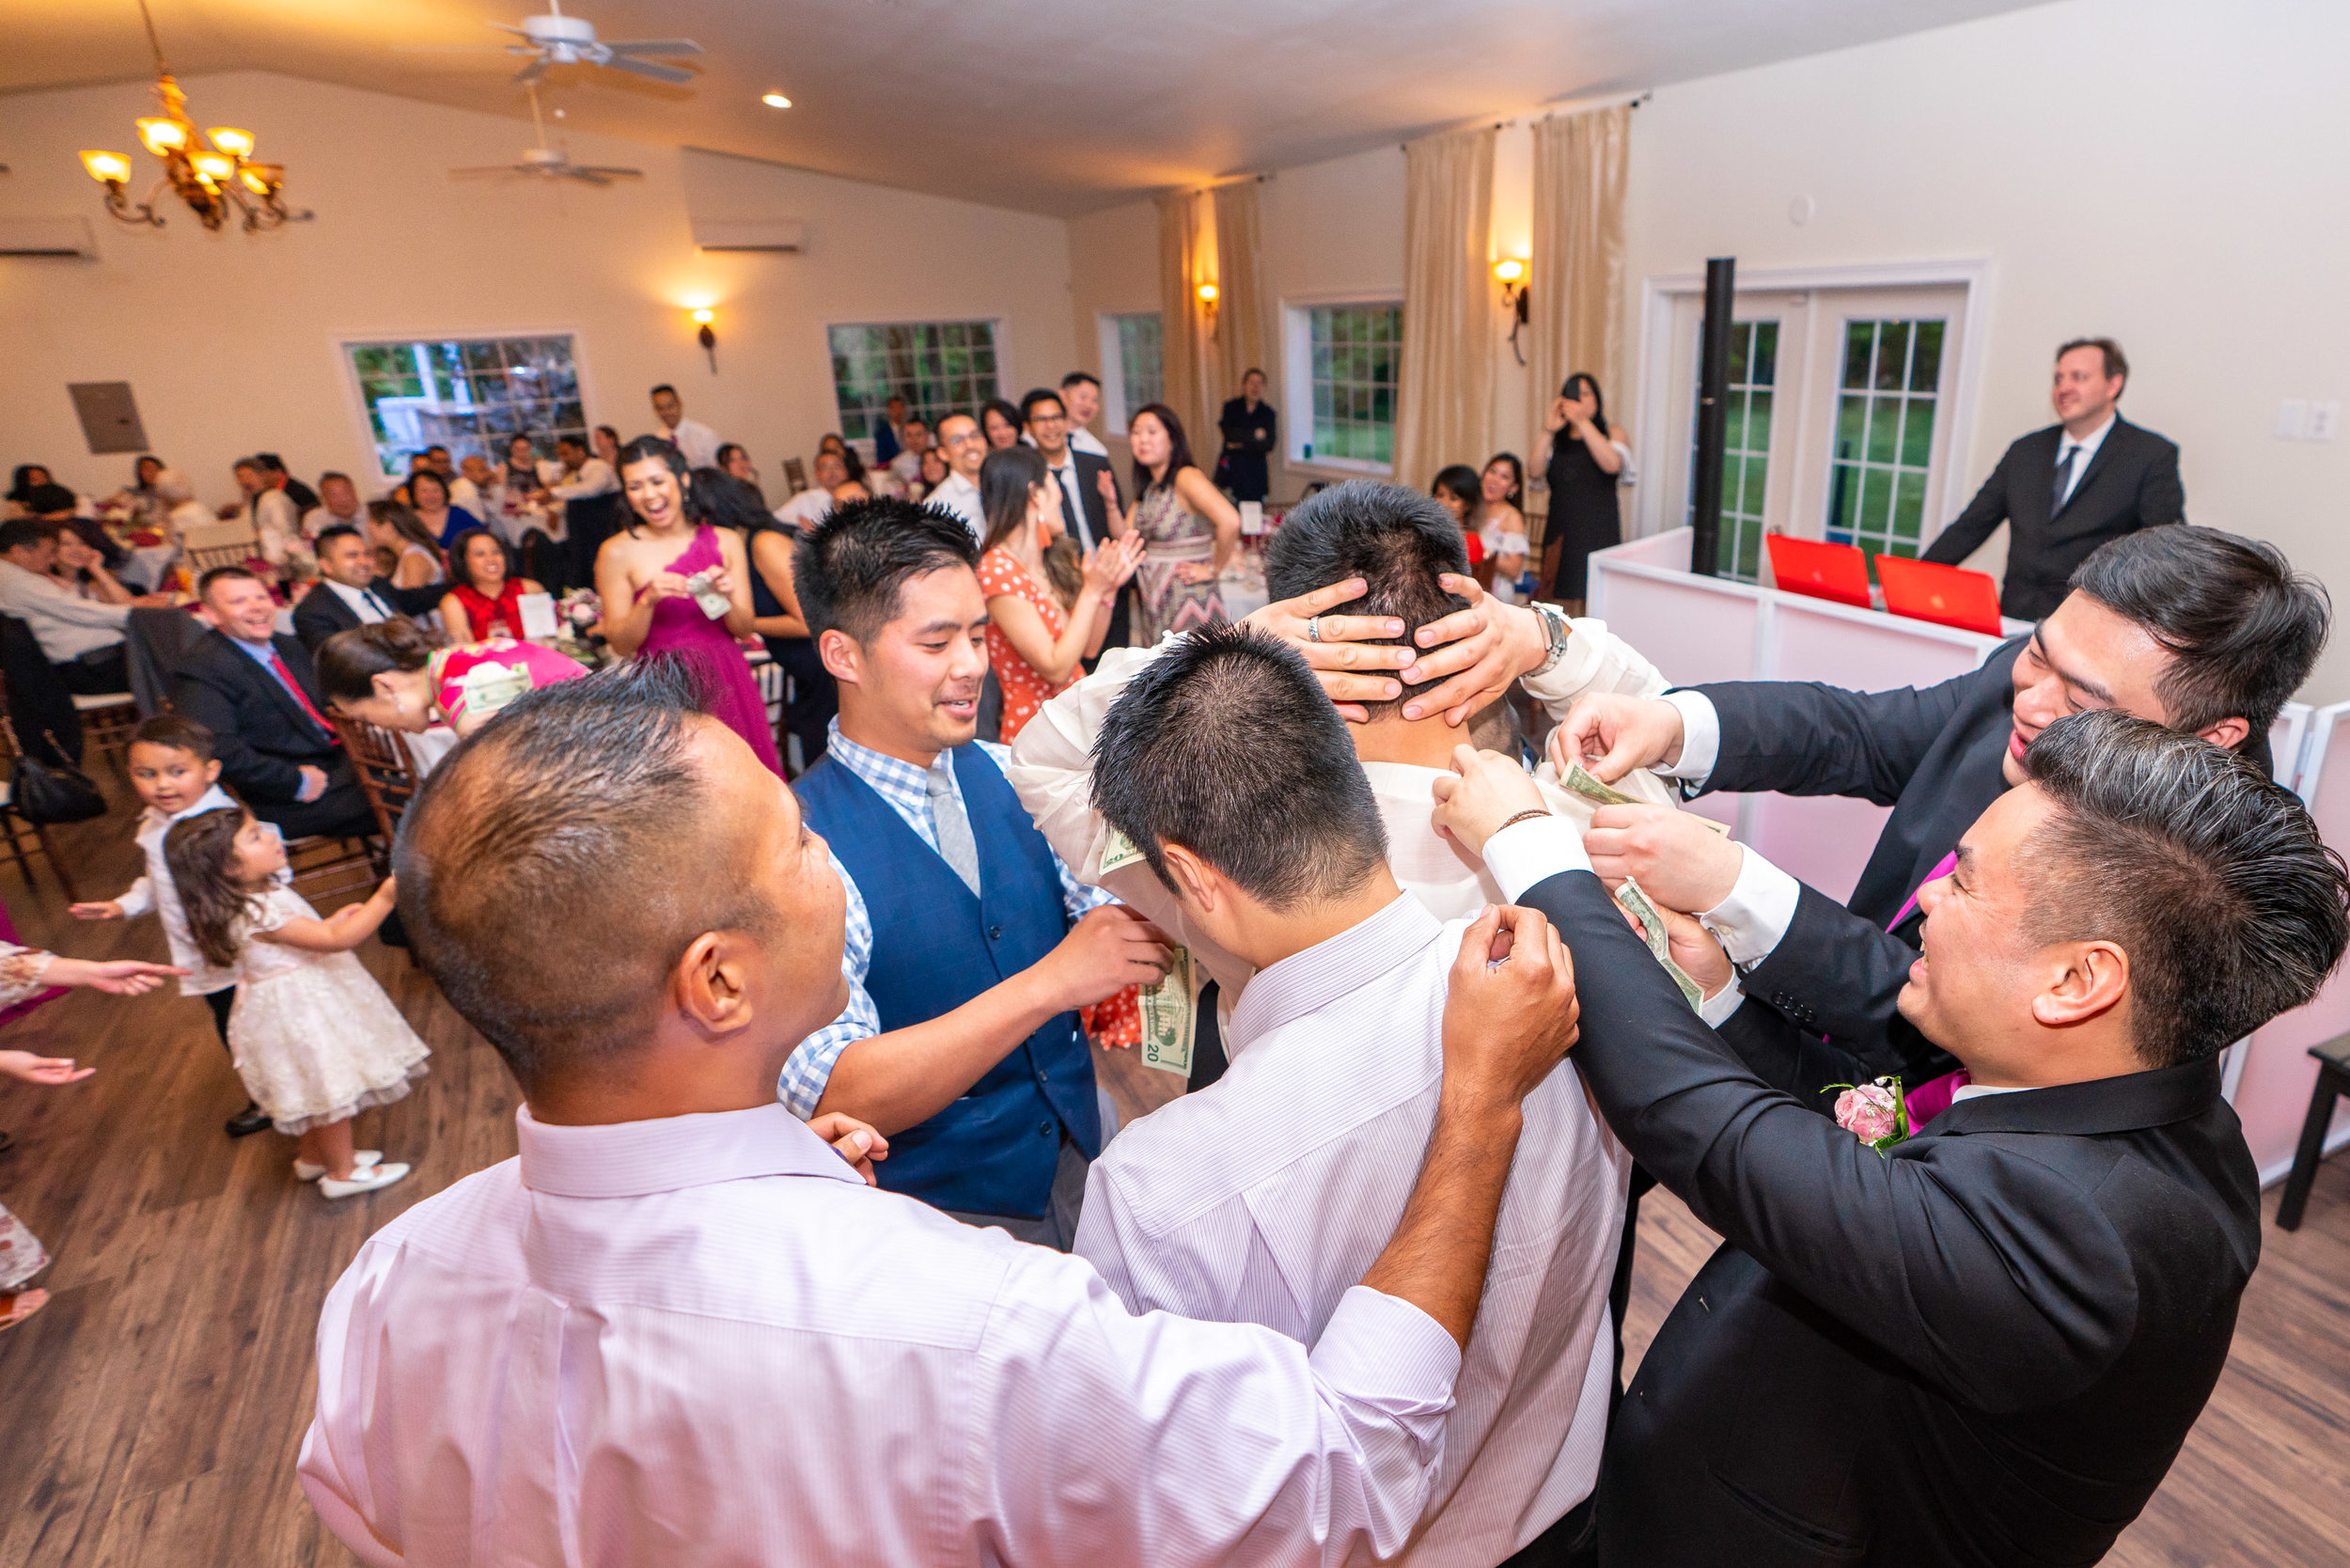 Groomsmen at Lost Creek Winery wedding money dance